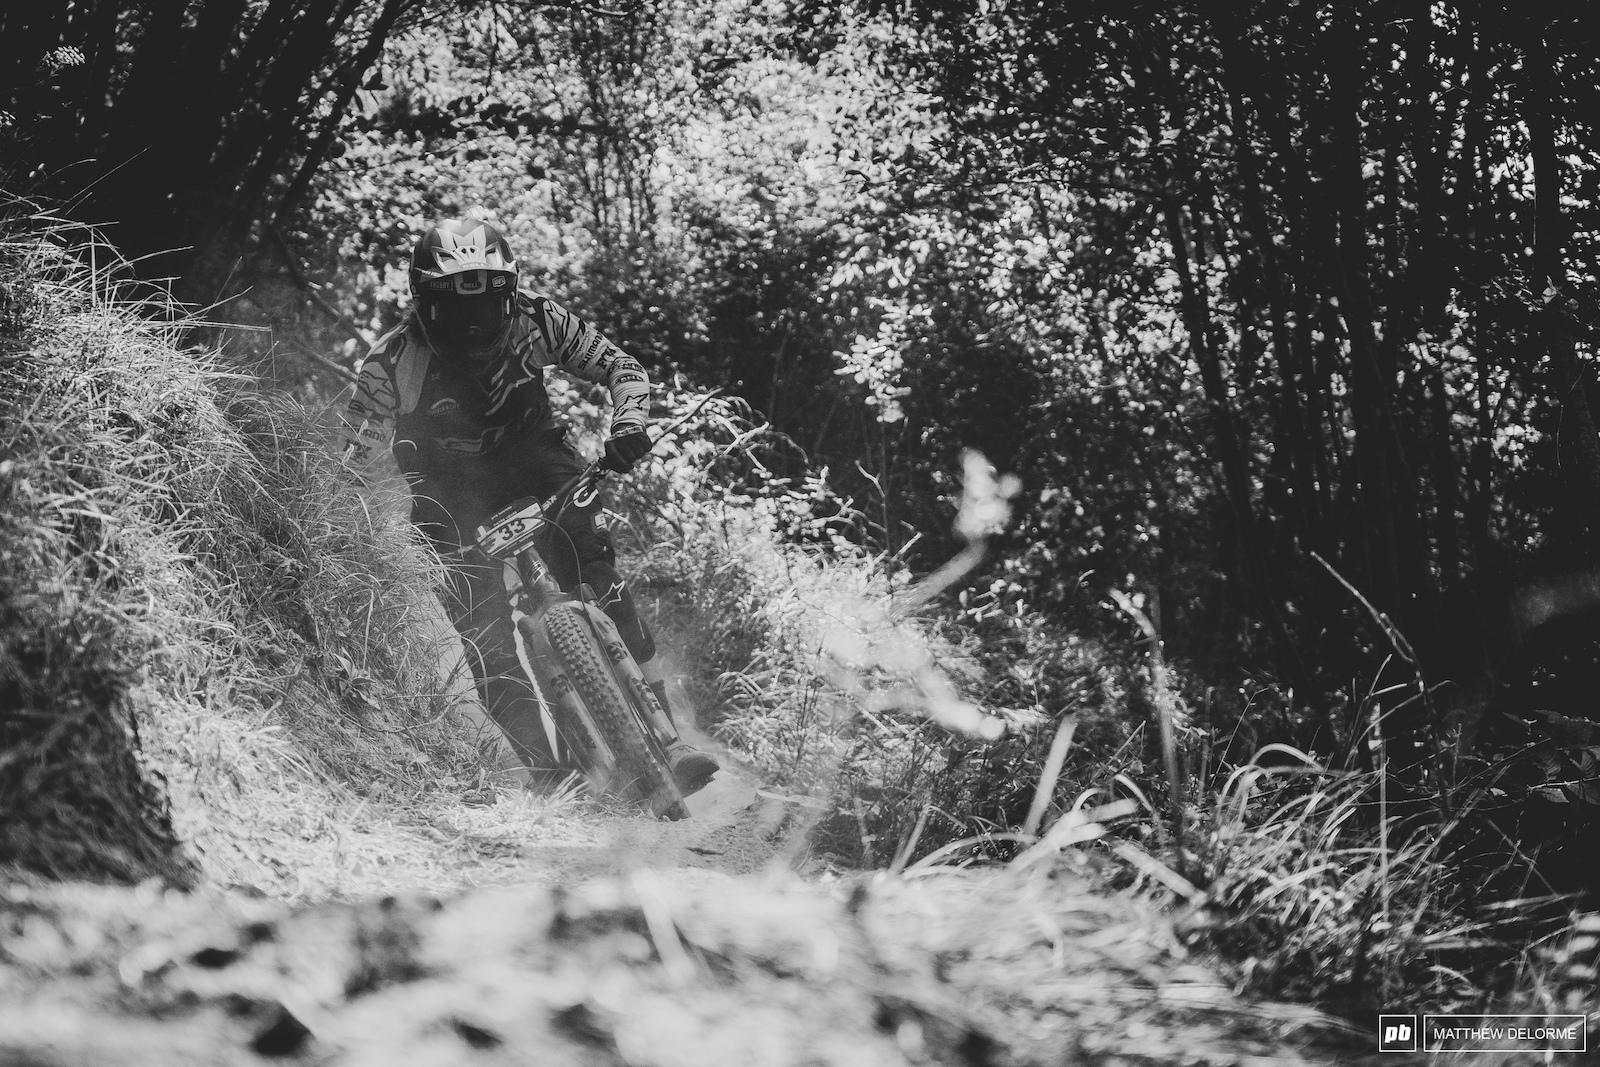 Wyn Masters plowing his way through some Ligurian brown powder.